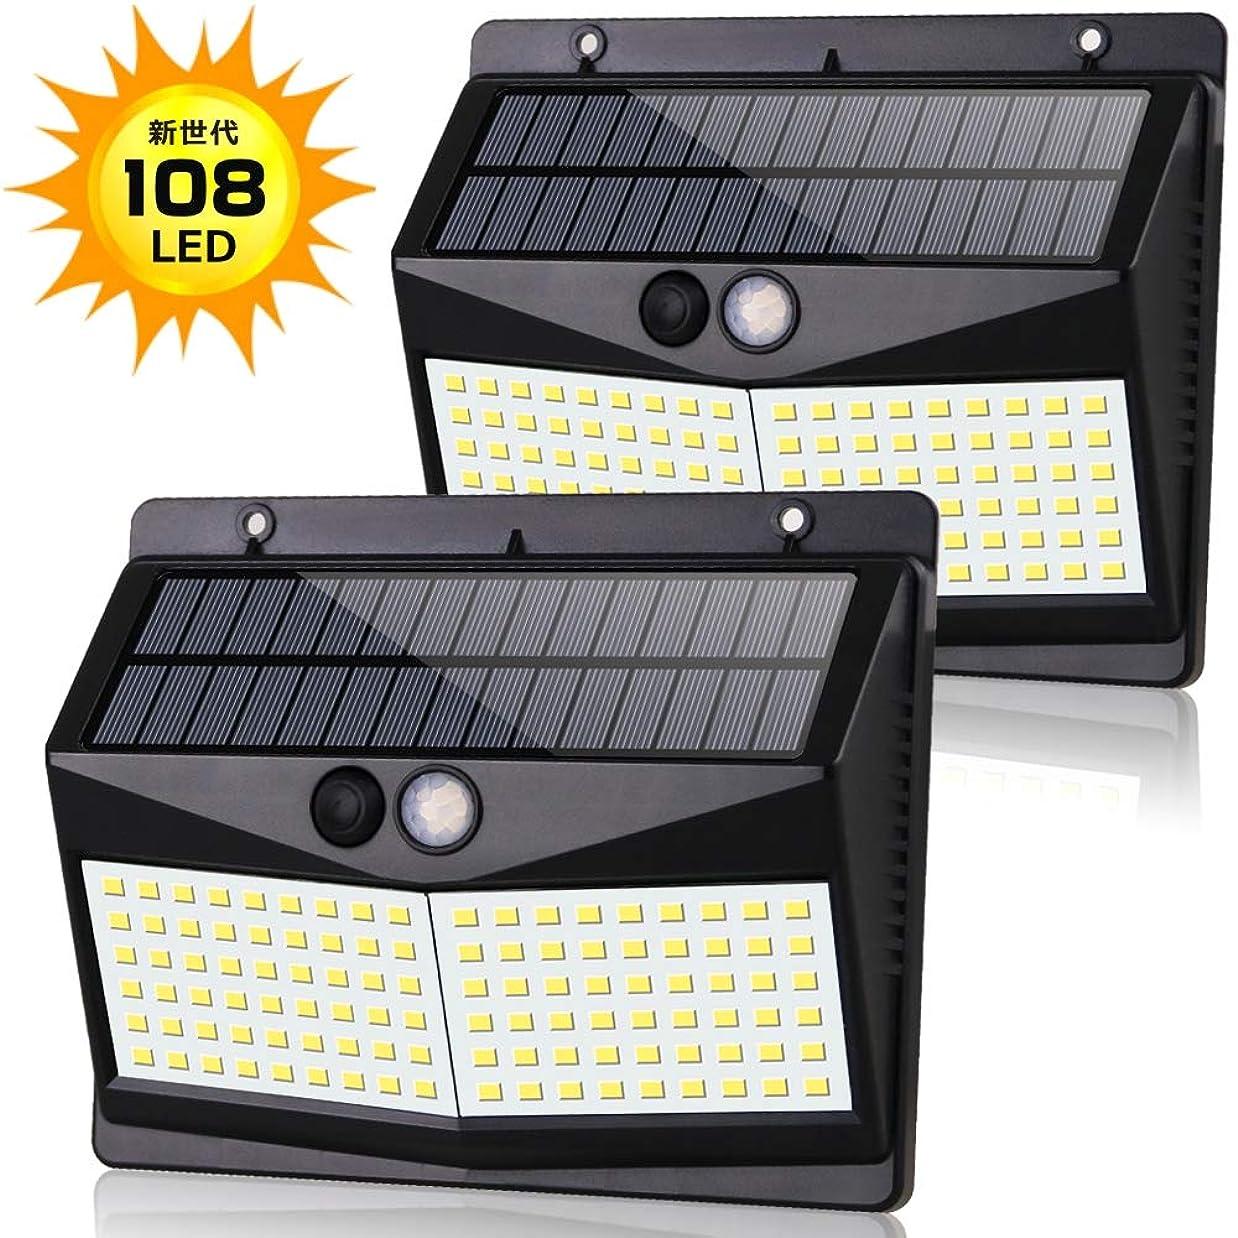 俳優旅行者予言する「Sunpie」LED投光器 10~144W 超薄型 投光器 充電式 バッテリー内蔵 防水 高輝度 作業灯 地震 防災対策 2年保証